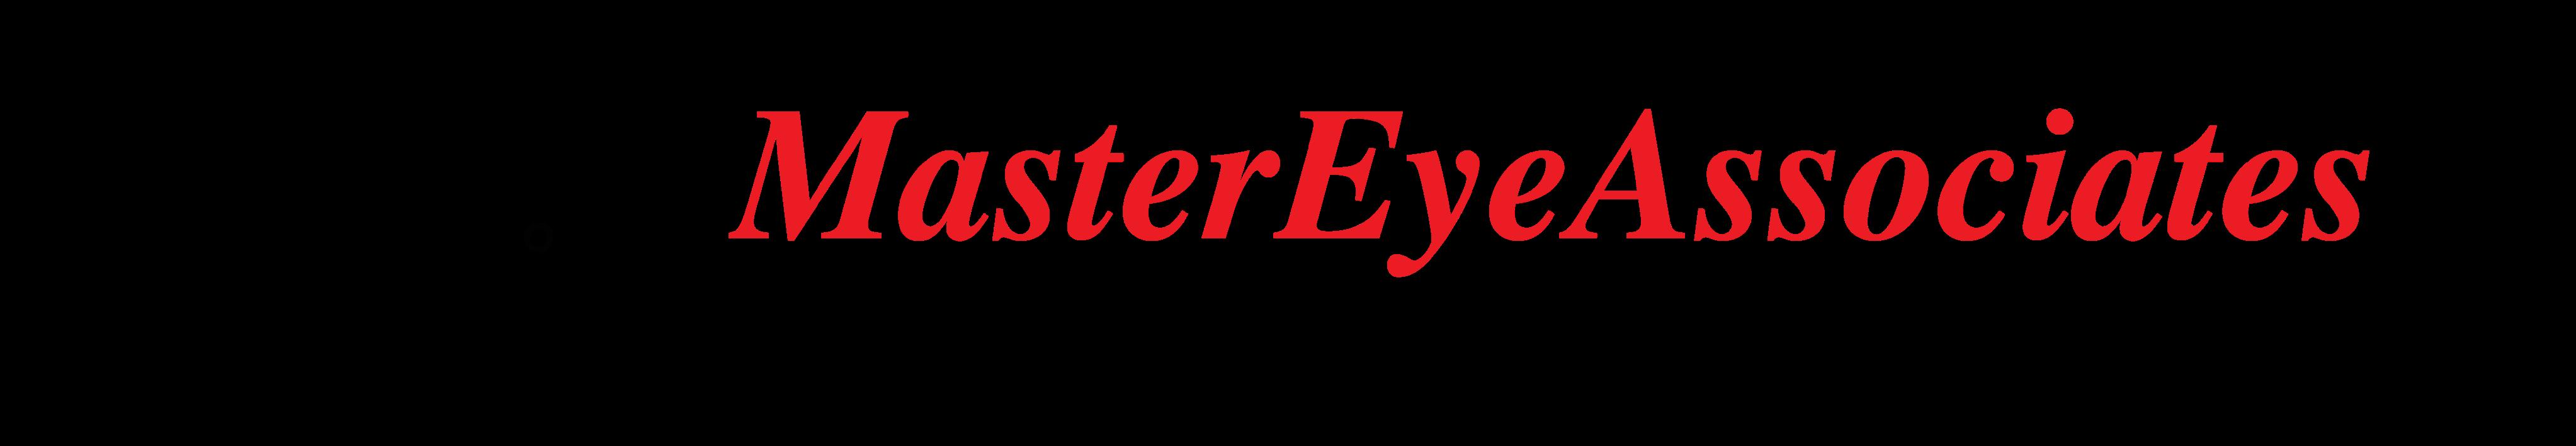 Logo no 7 days Master Eye Associates-Transparency Better Size